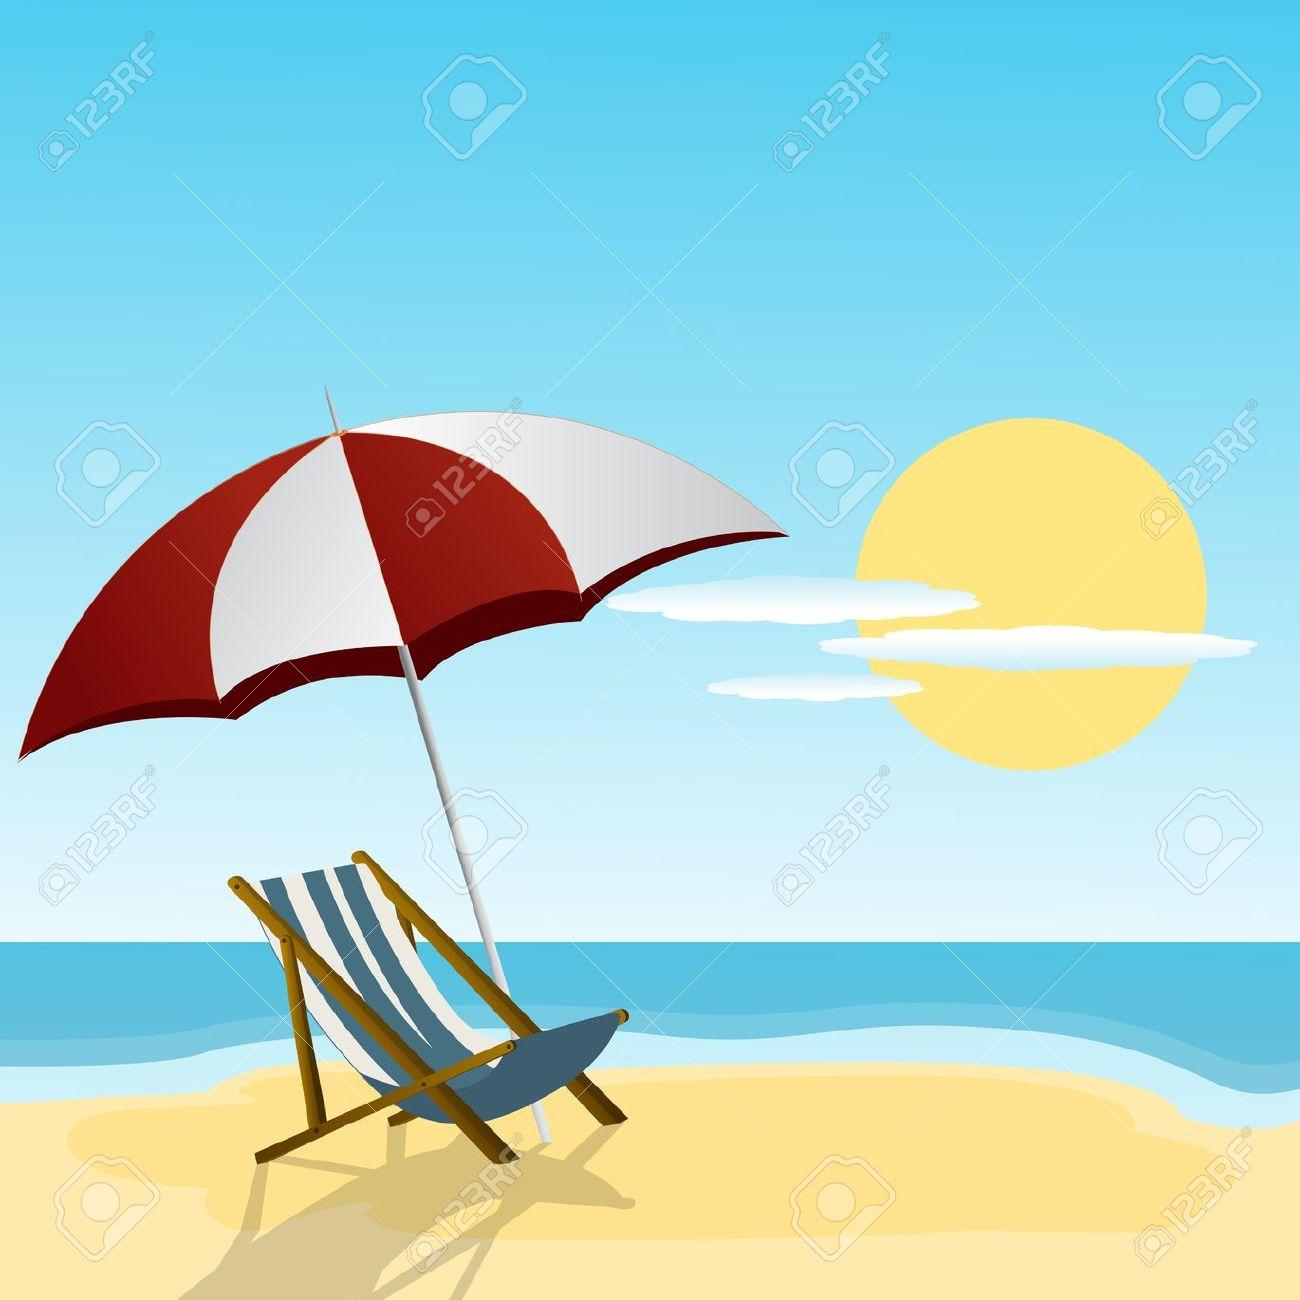 Summer beach scene clipart banner library Summer Scene Clipart   Free download best Summer Scene ... banner library